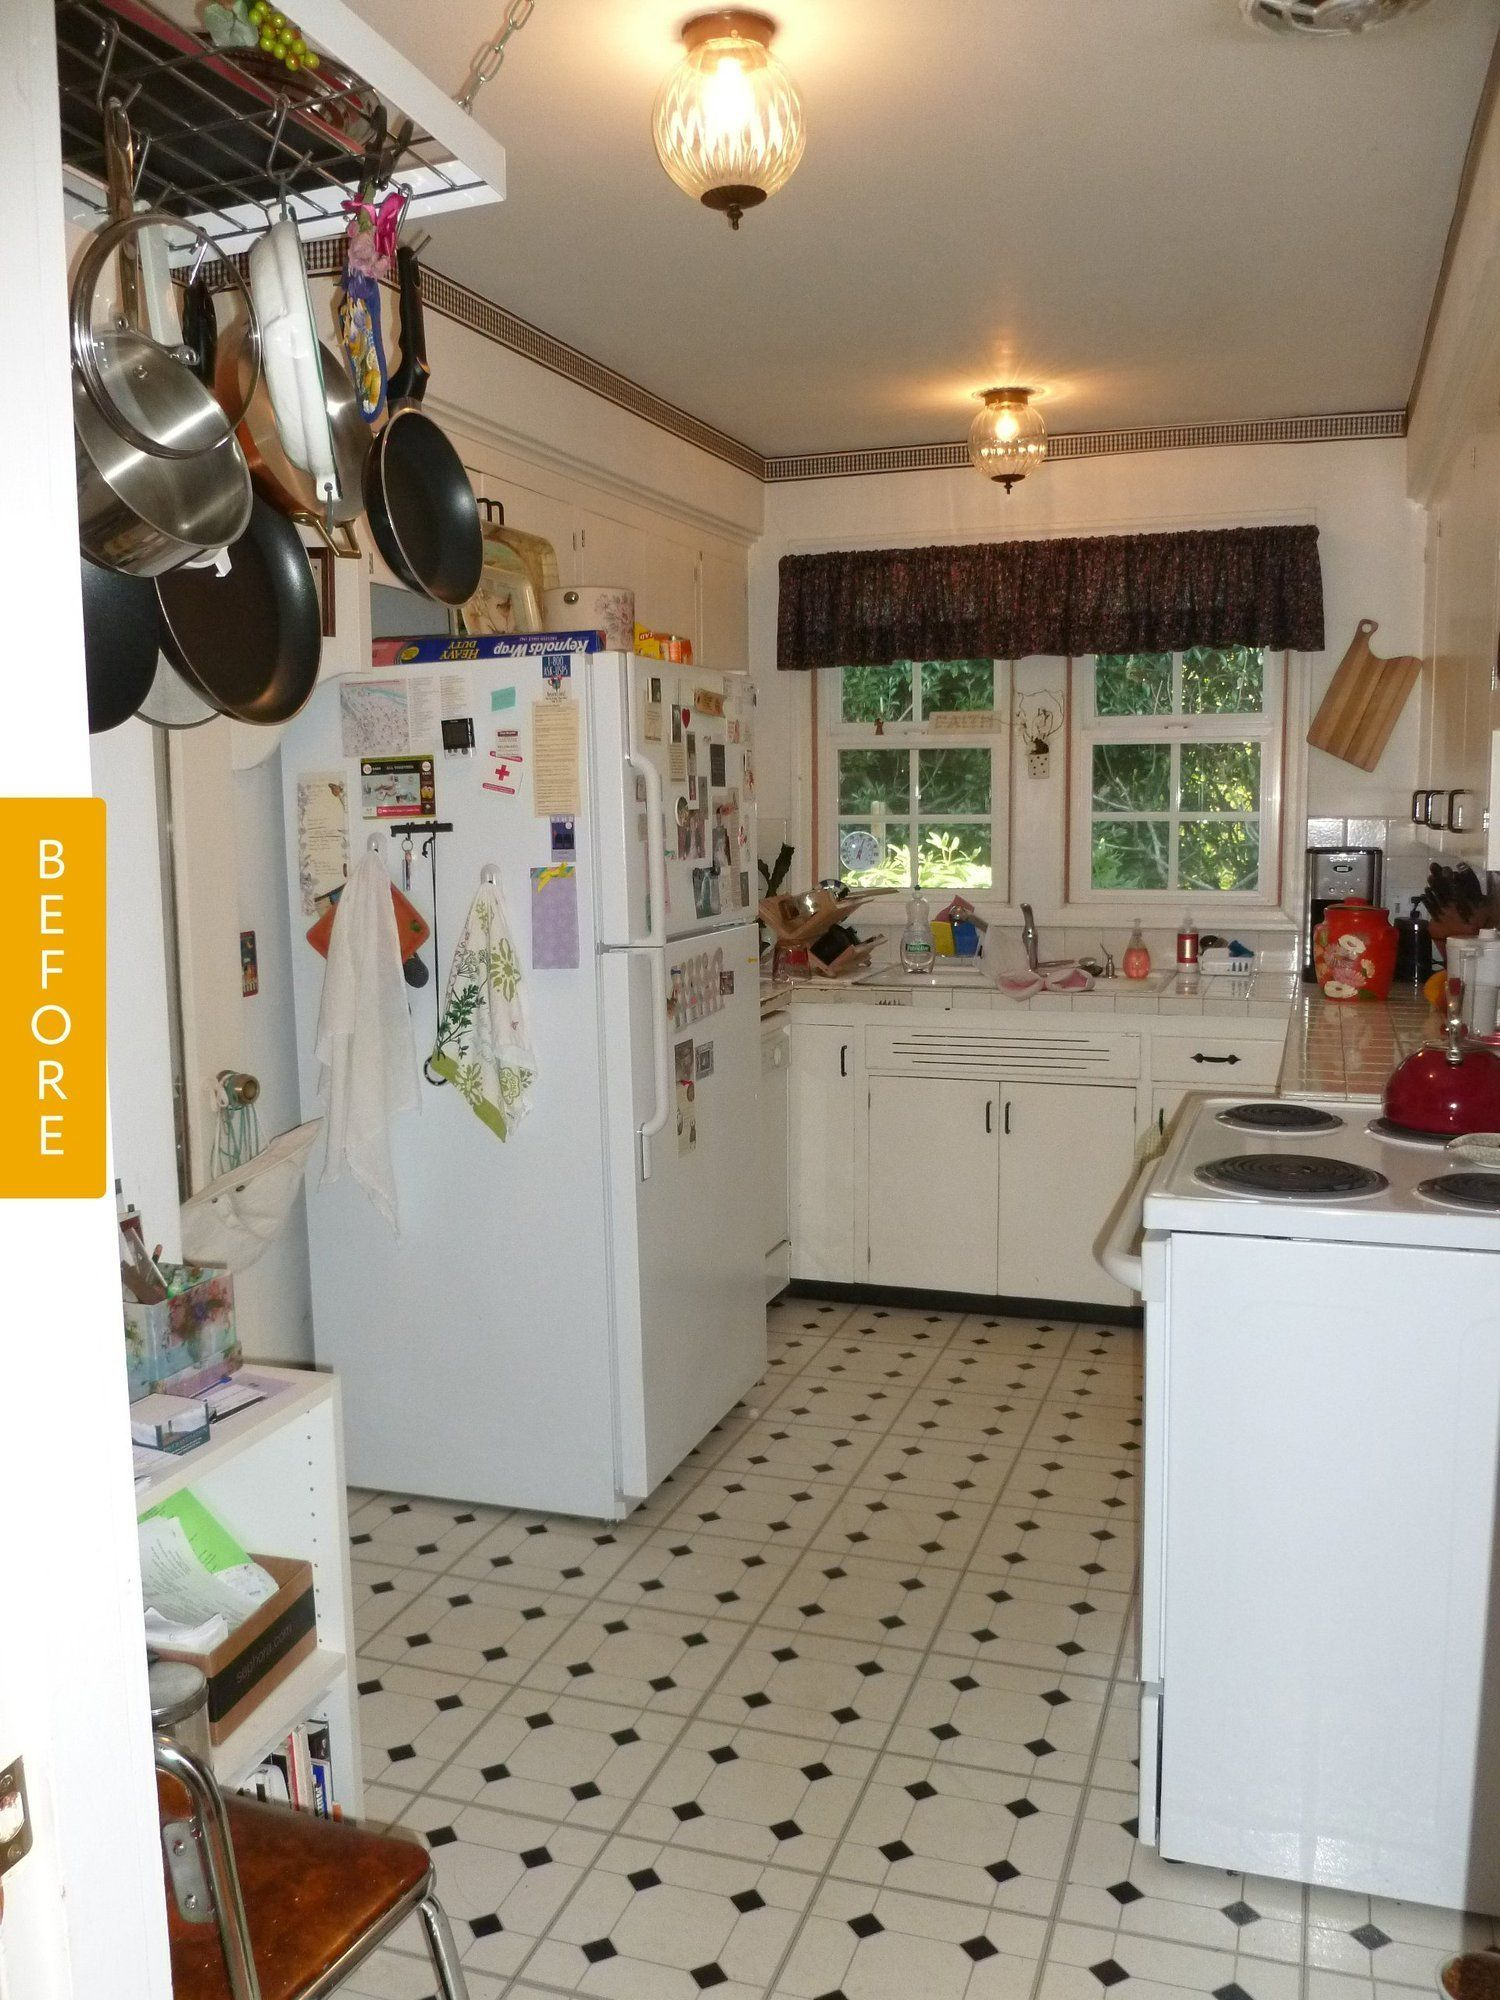 Before After A 1940s Kitchen Gets An Era Appropriate Makeover Kitchen Remodel Small Kitchen Remodel Design 1940s Kitchen